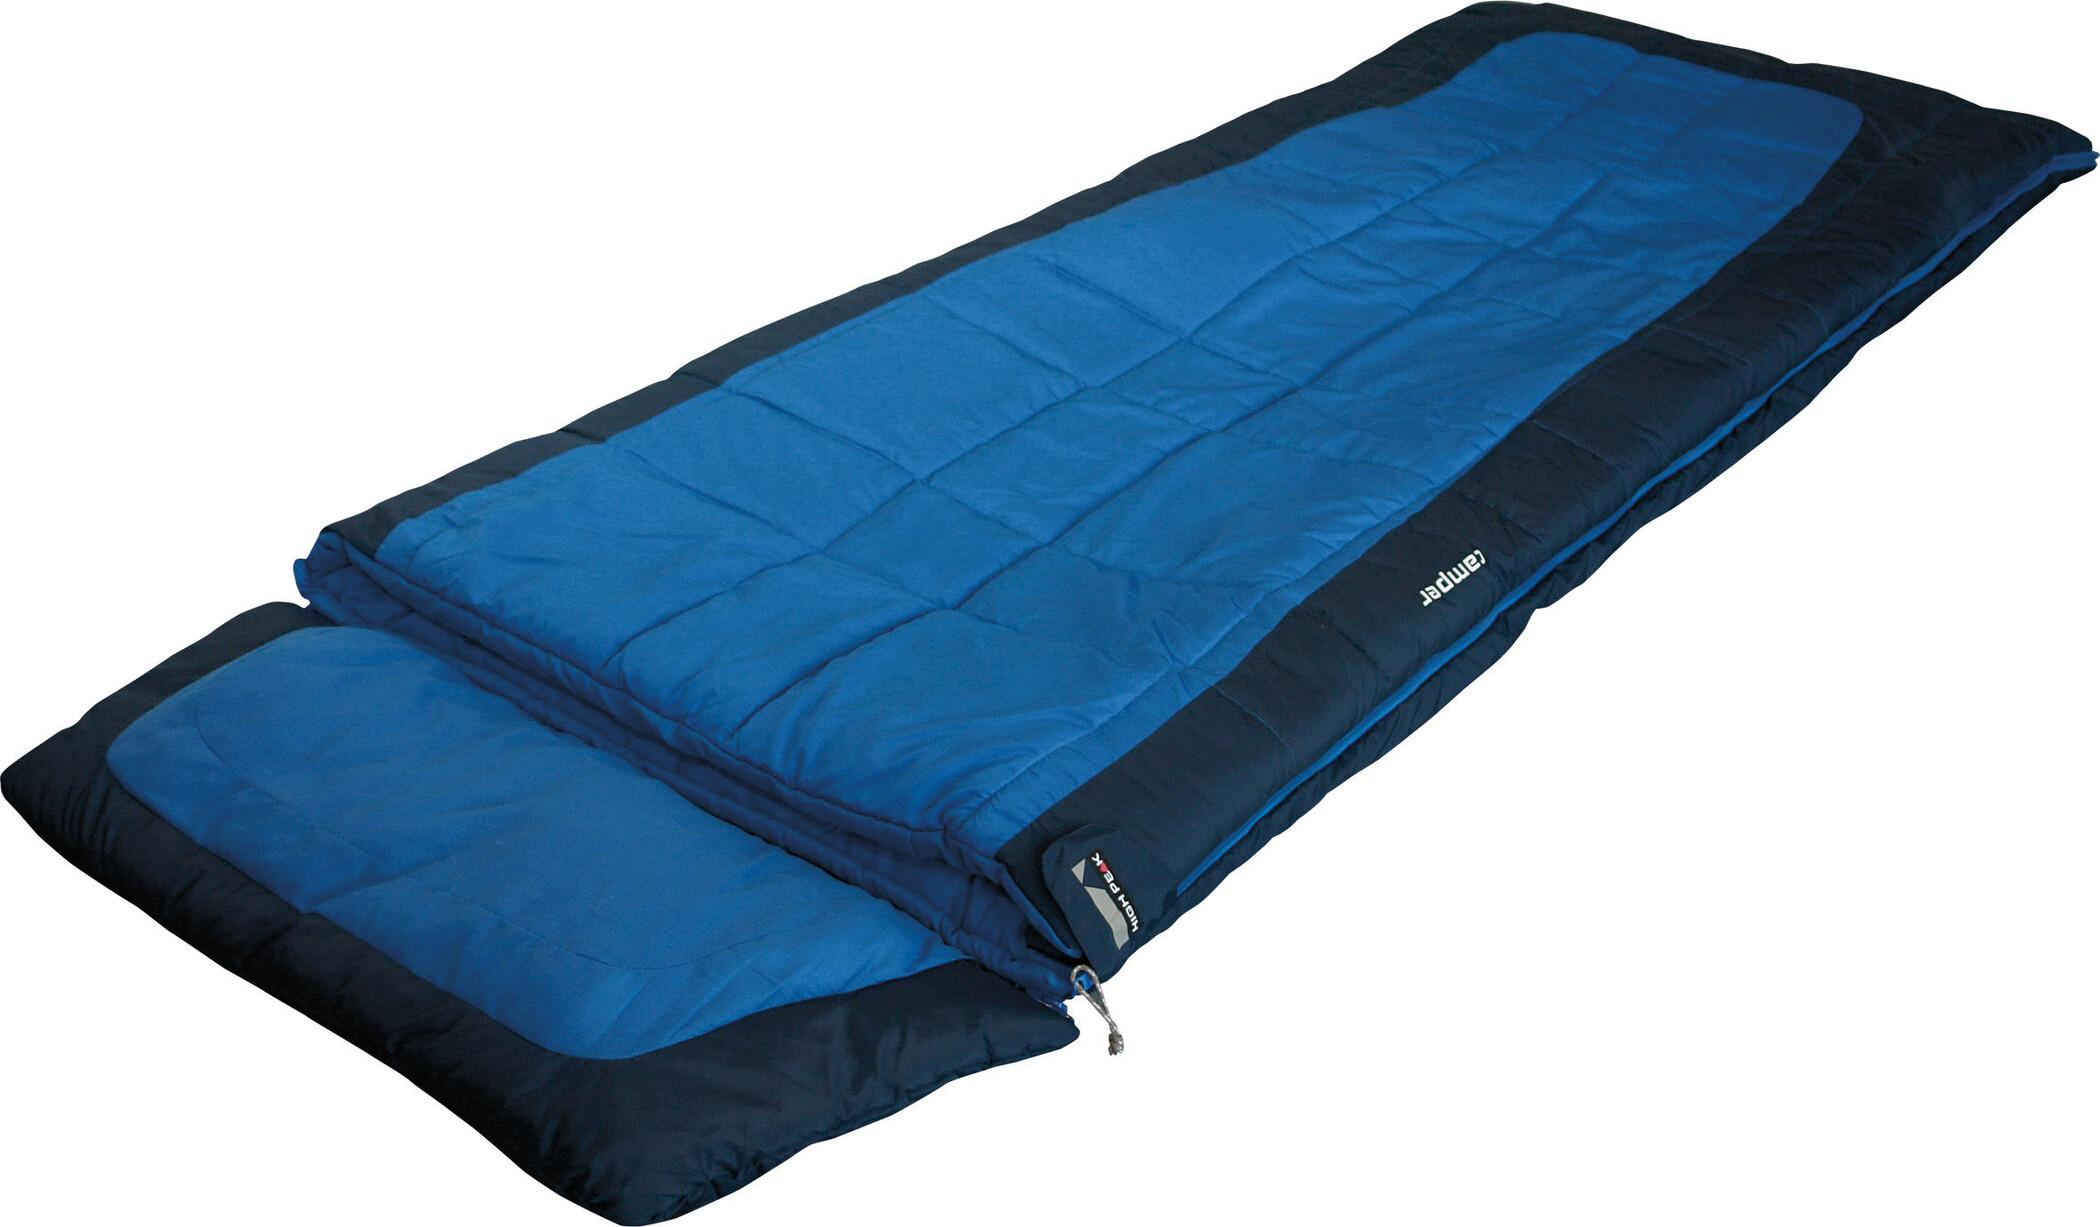 High Peak Camper Sovepose, blue/dark blue   Misc. Transportation and Storage